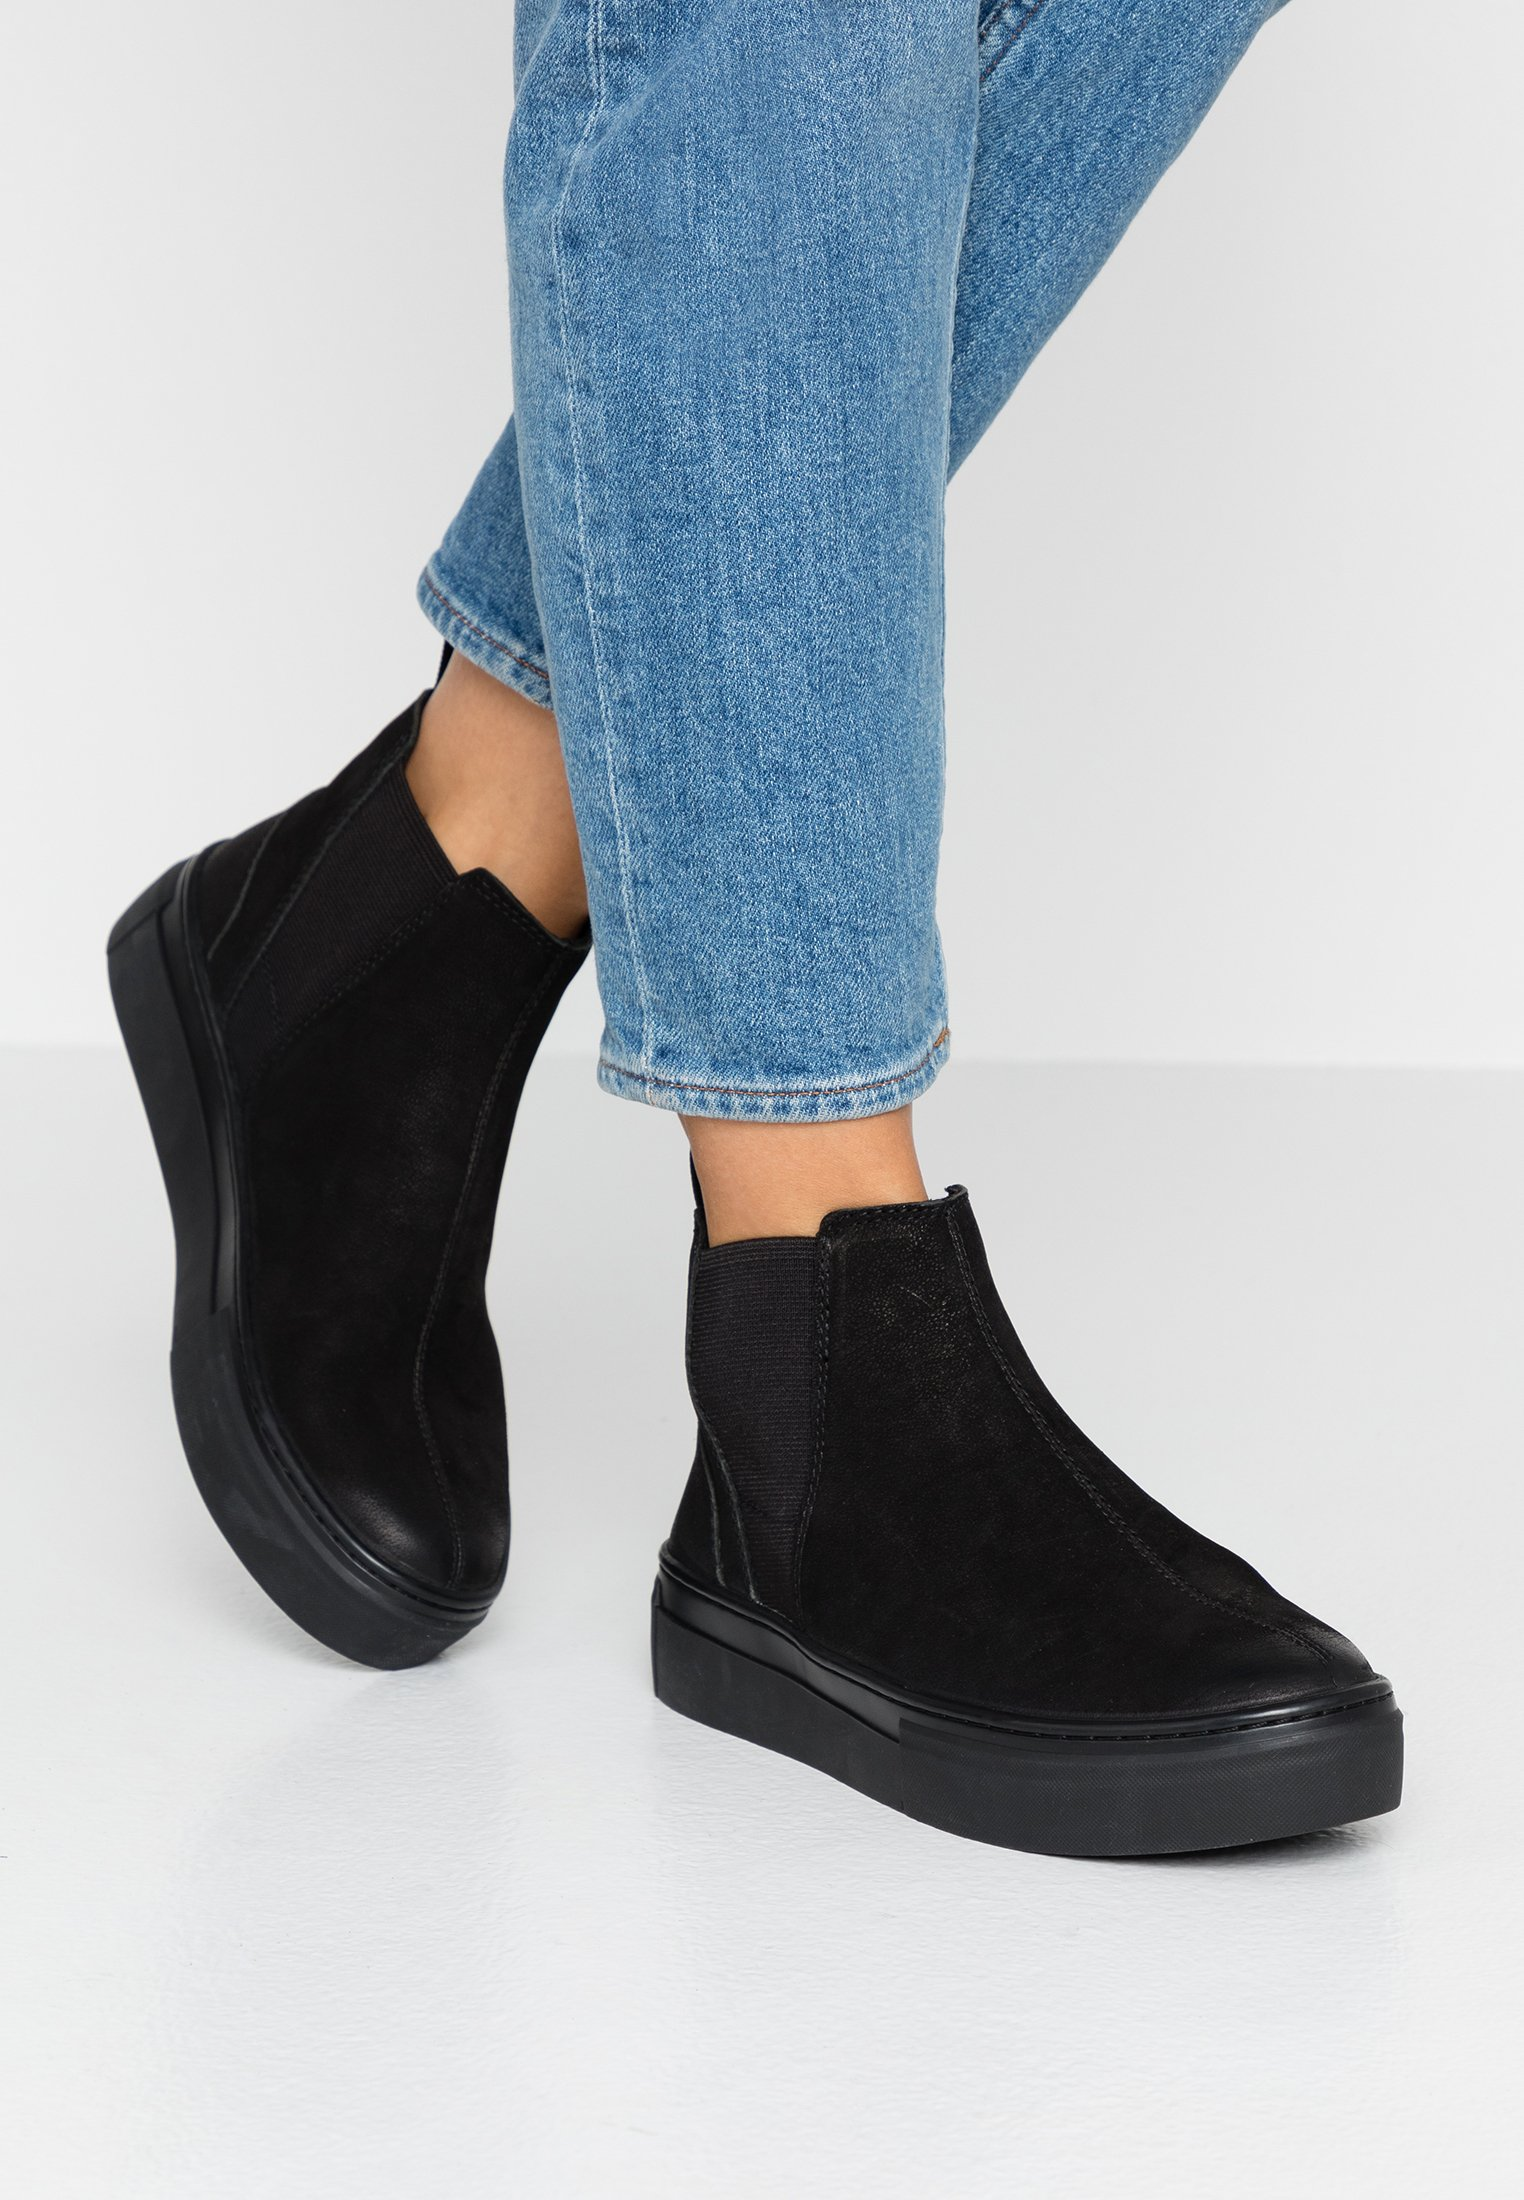 Womens Vagabond Amina svart läder Brogue Casual Chelsea